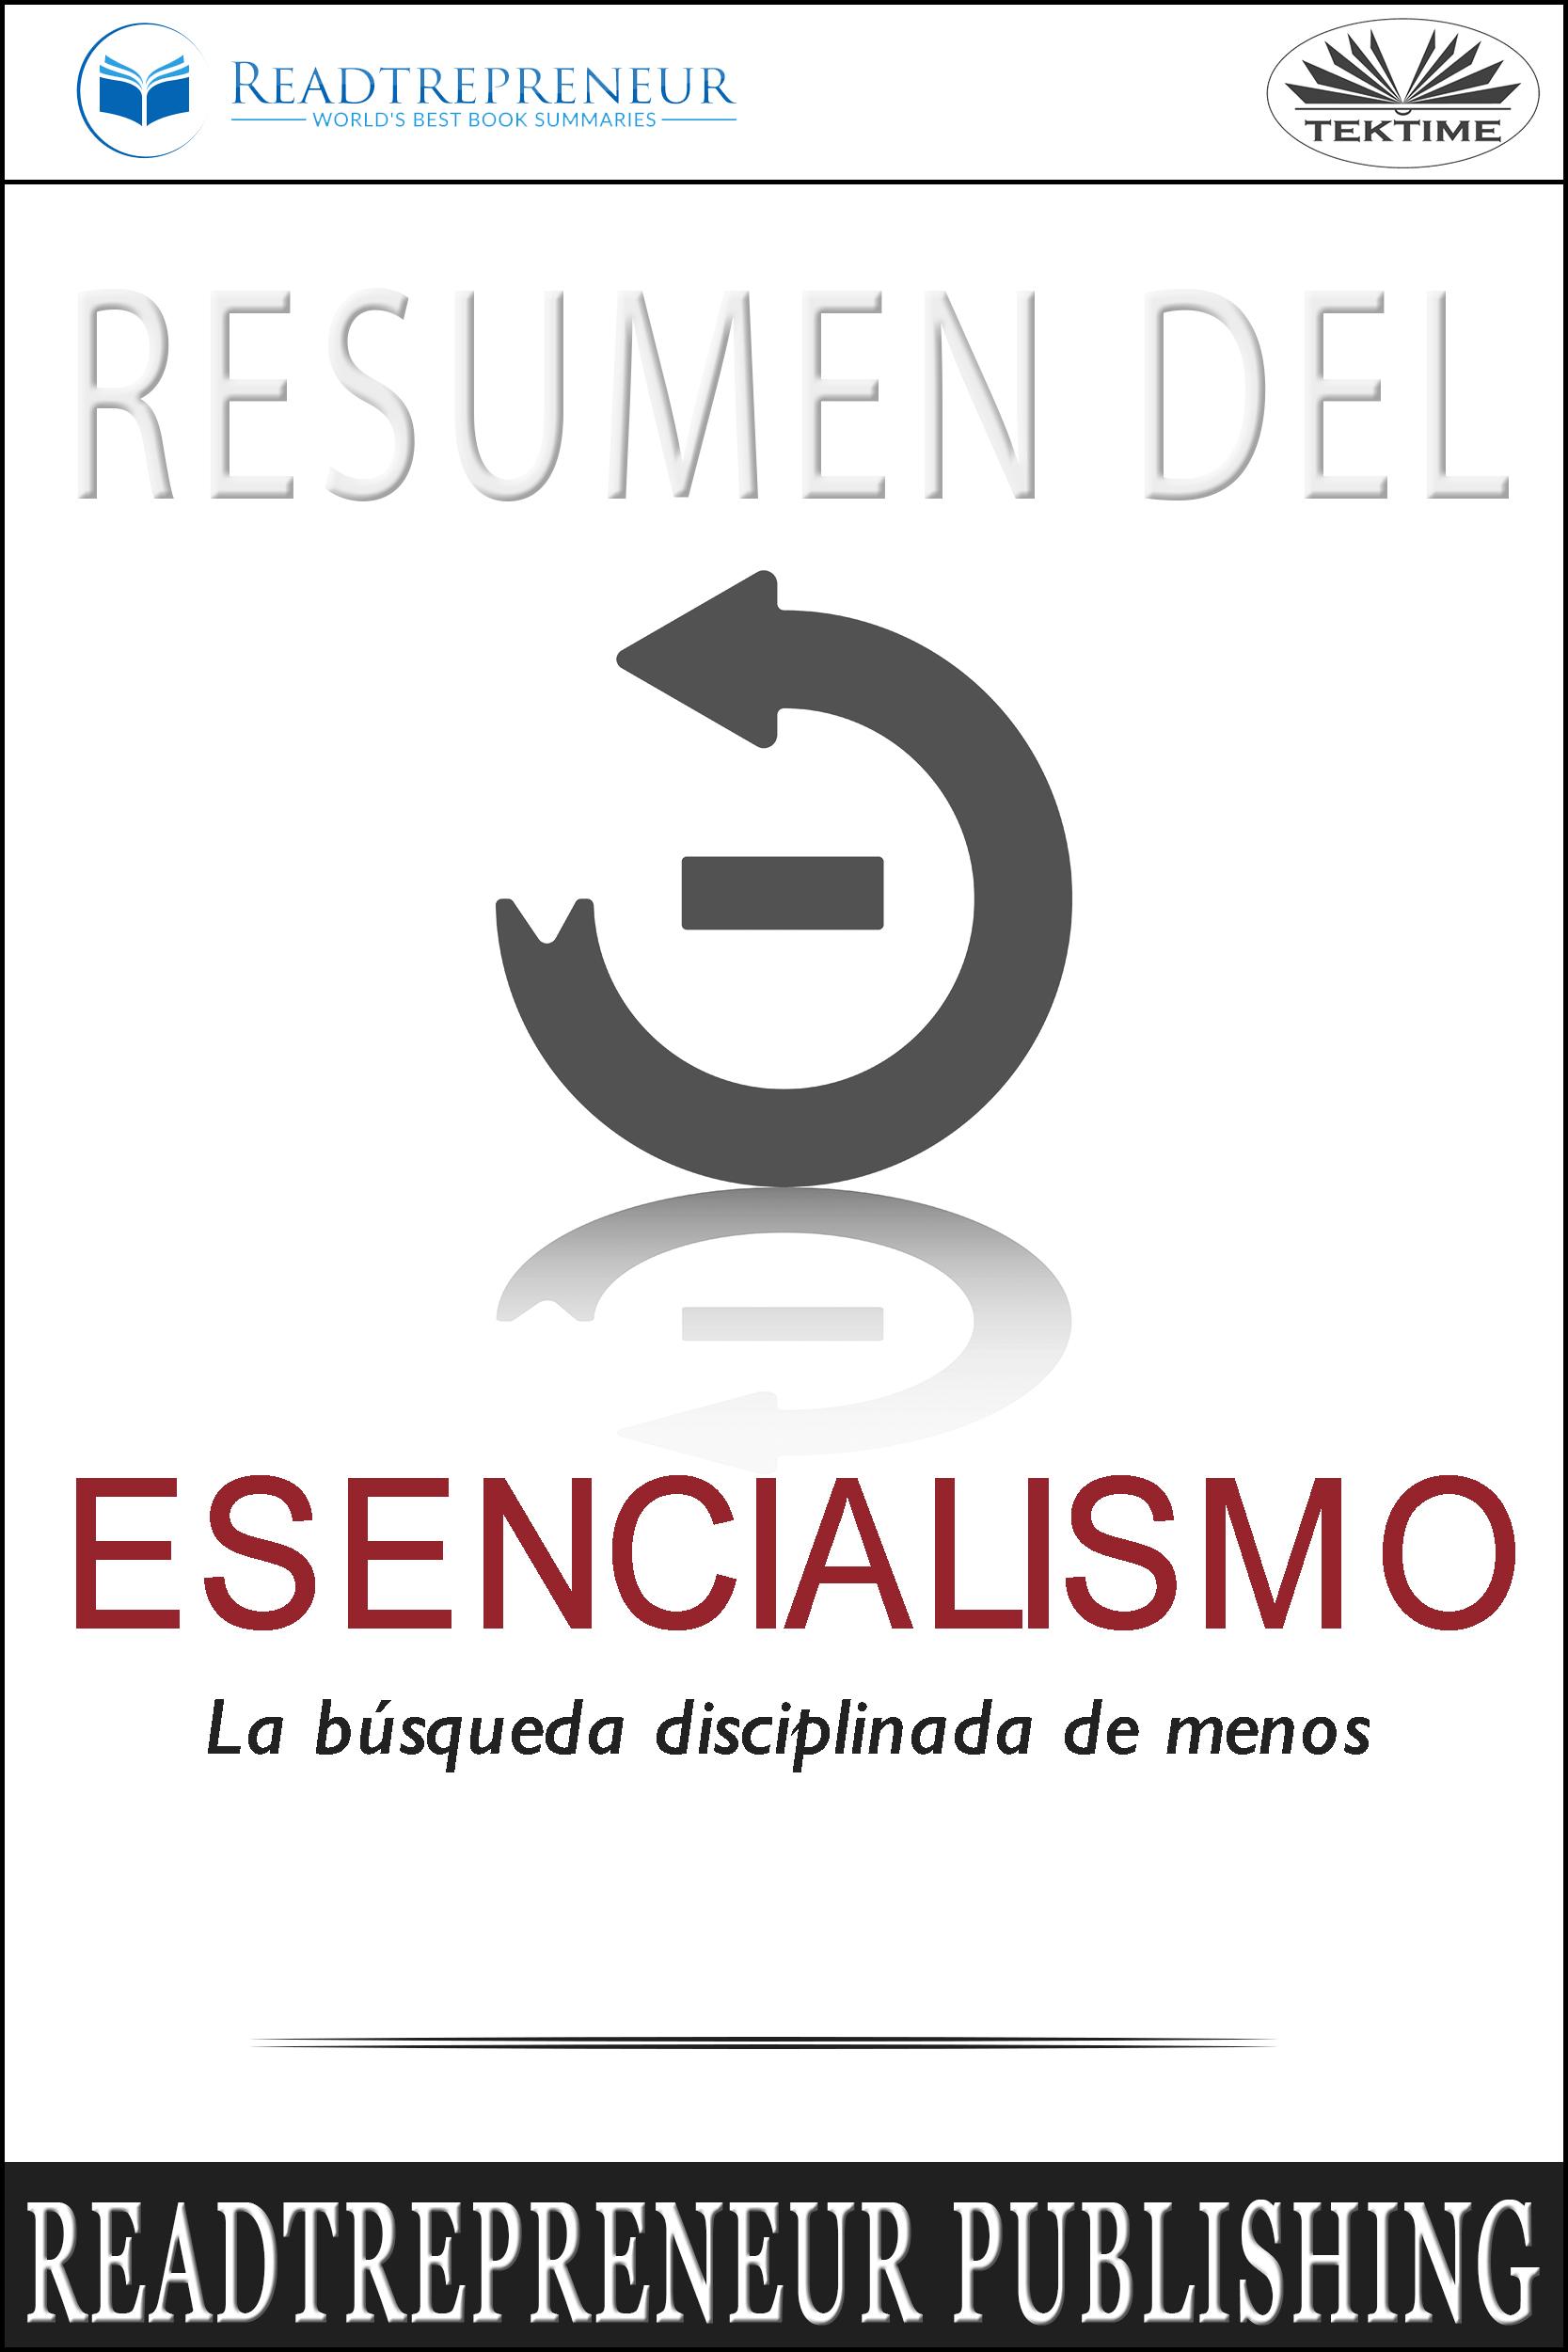 цена Readtrepreneur Publishing Resumen Del Esencialismo: La Búsqueda Disciplinada De Menos онлайн в 2017 году